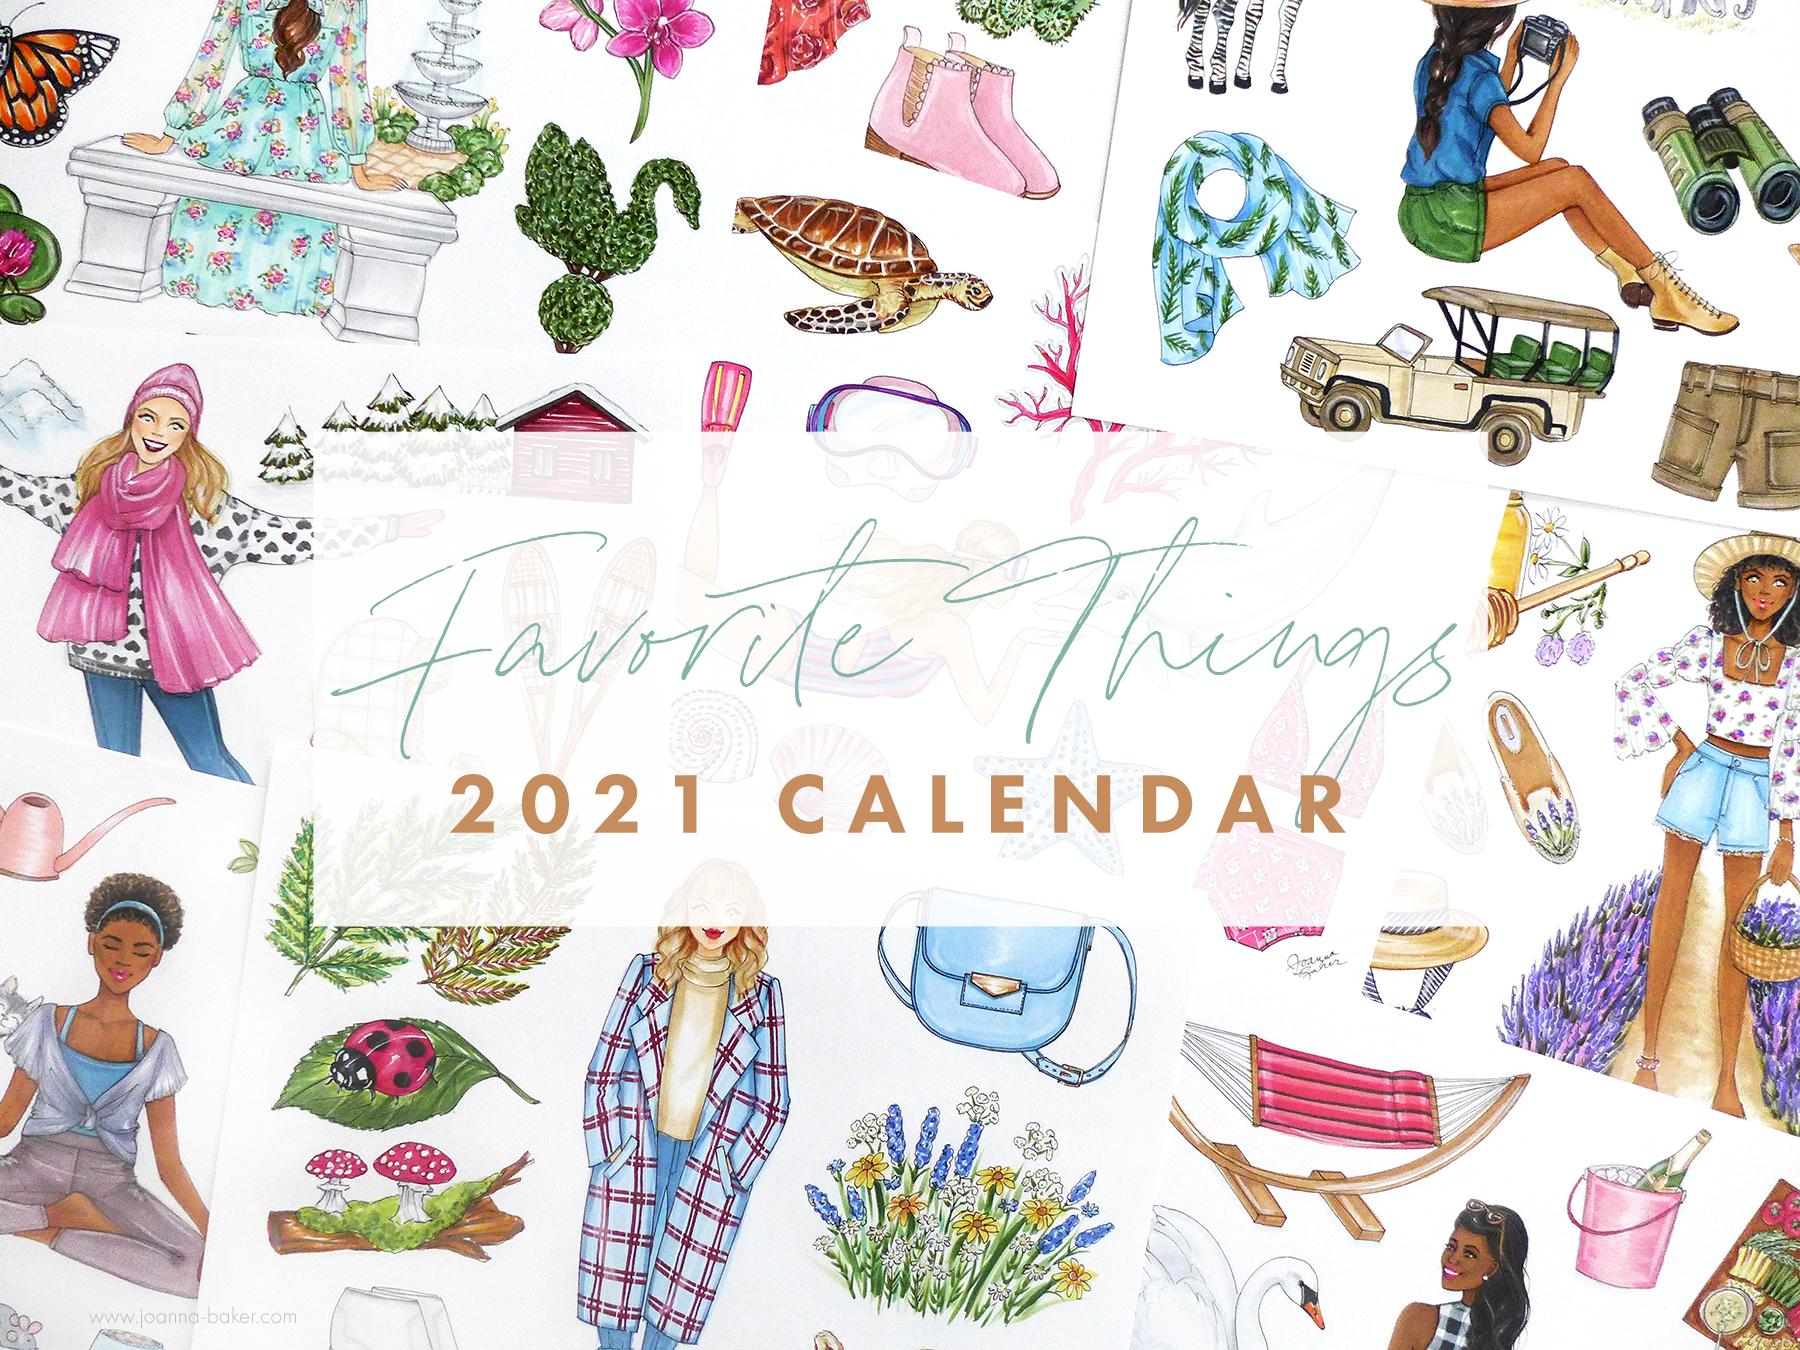 Favorite Things 2021 Calendar Preview by Joanna Baker